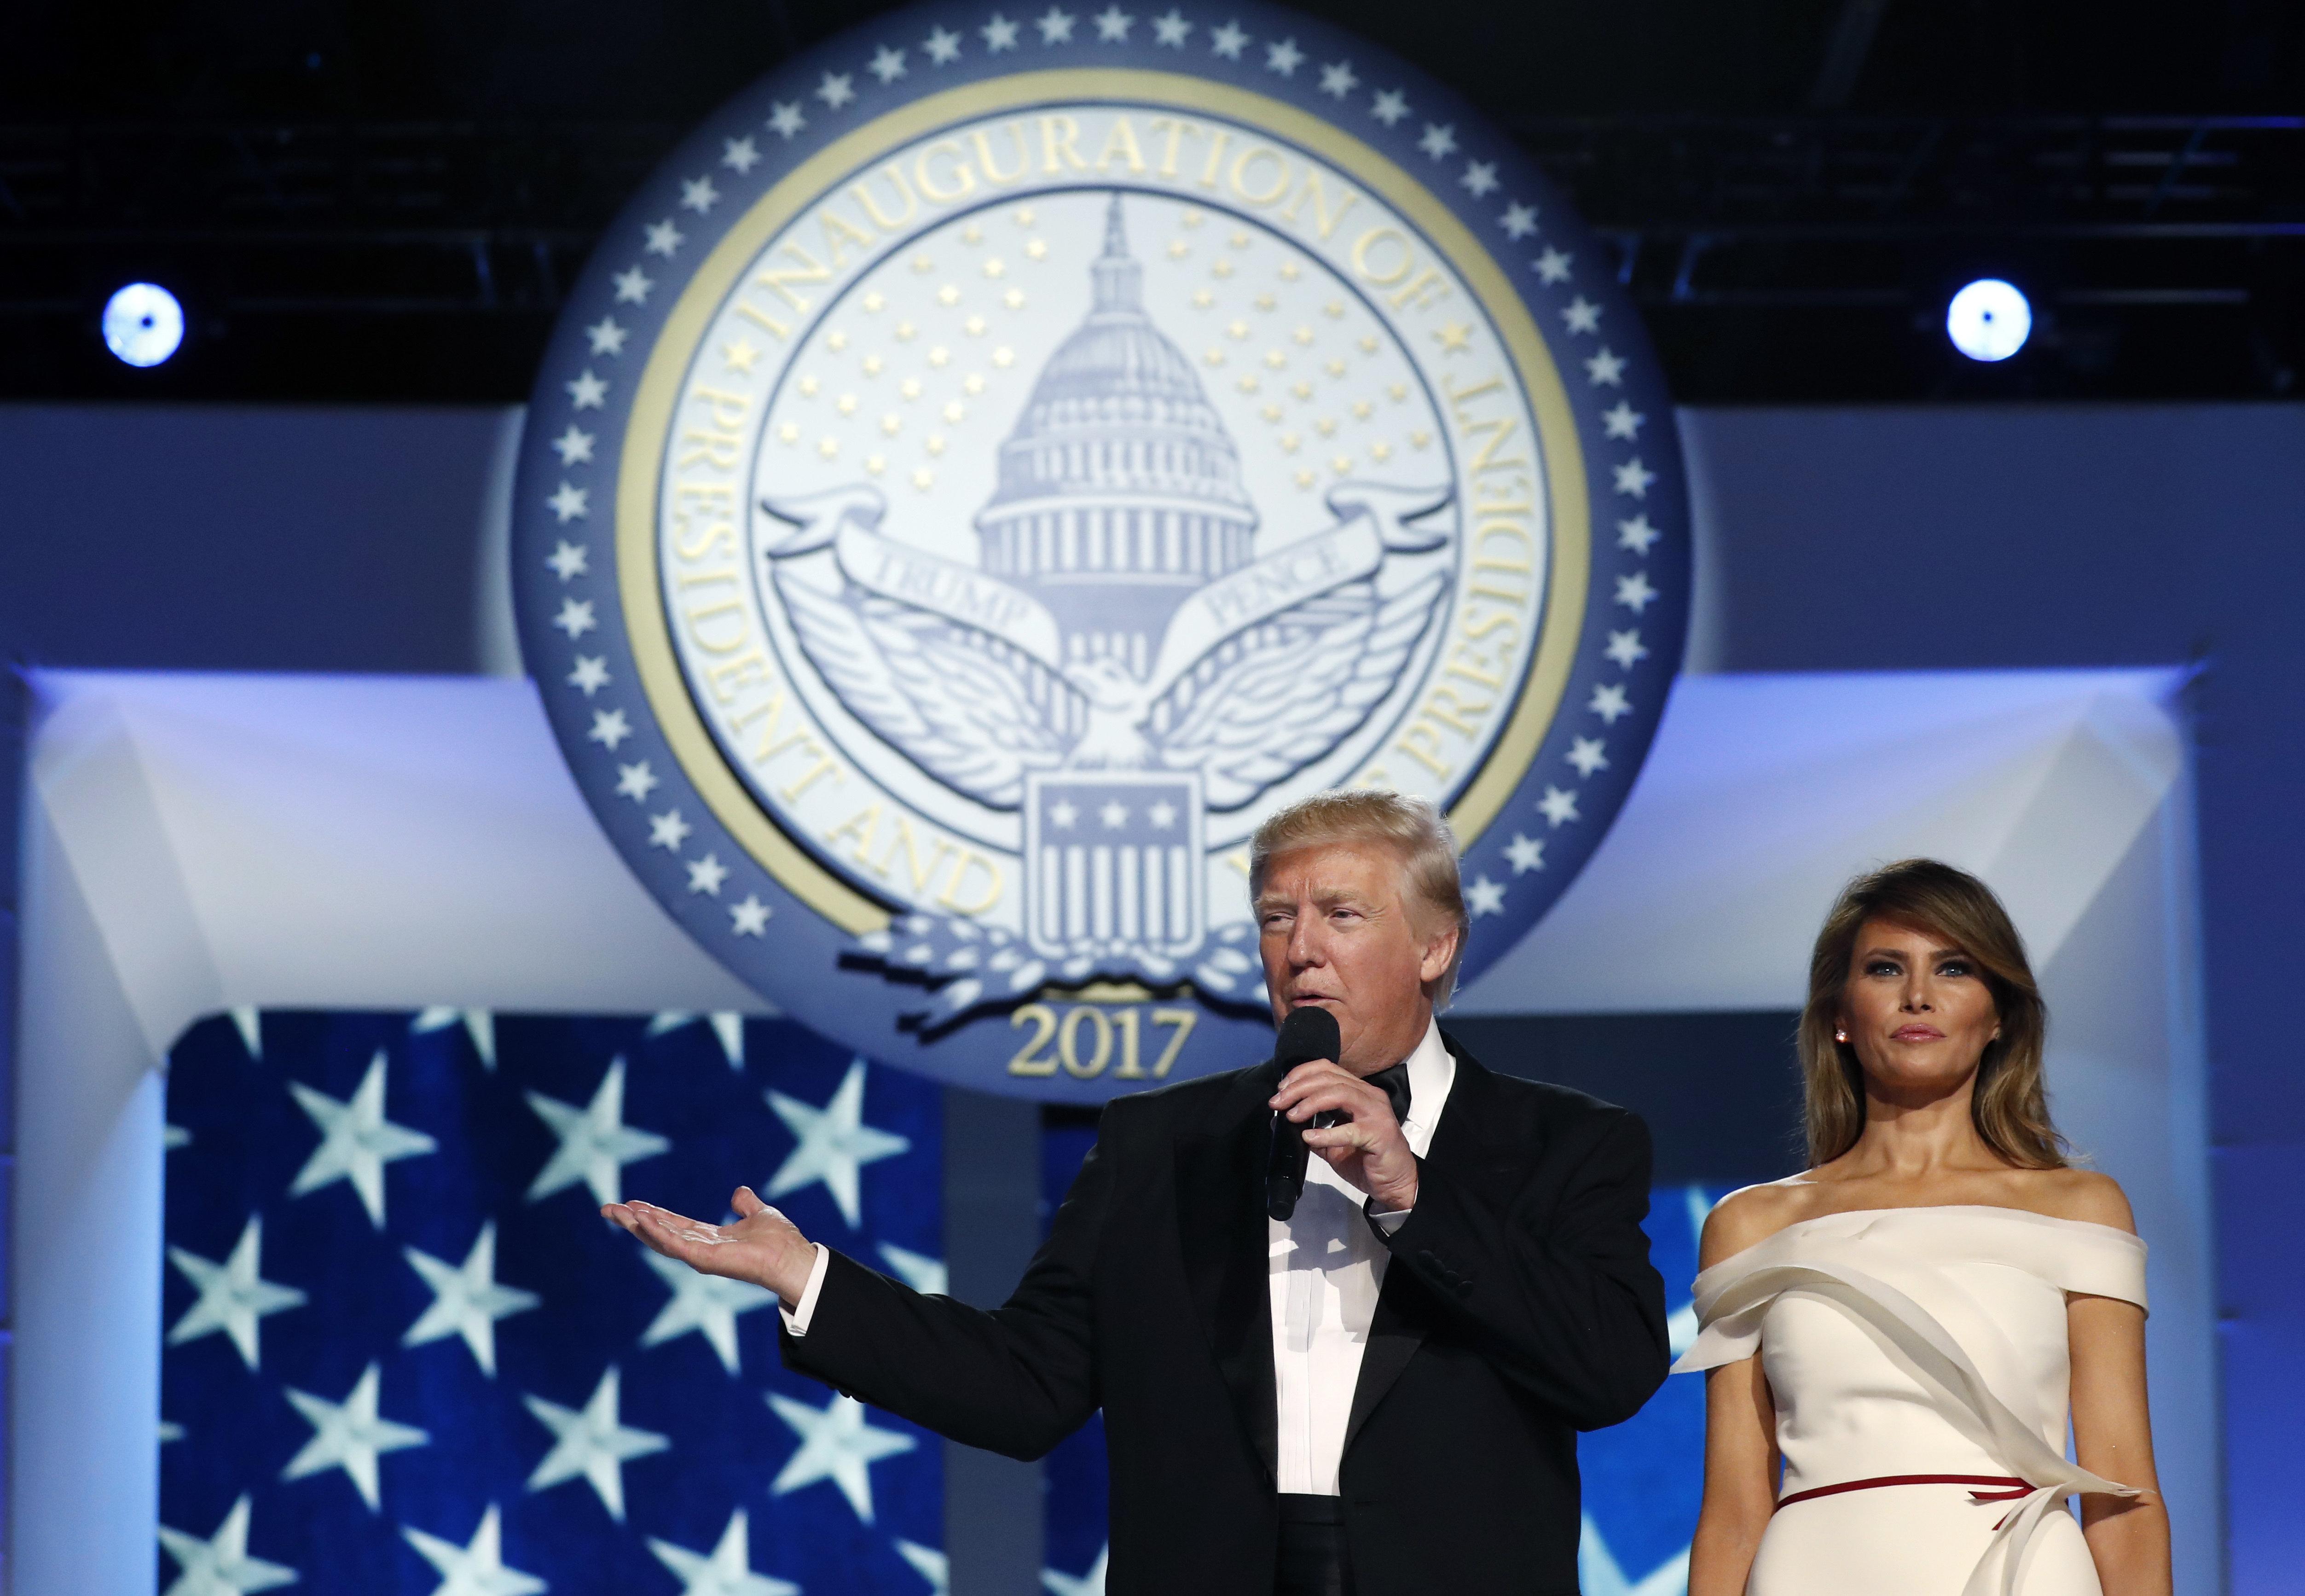 President Donald Trump talks as first lady Melania Trump listens at the Freedom Ball, Friday, Jan. 20, 2017, in Washington. (AP Photo/Alex Brandon)